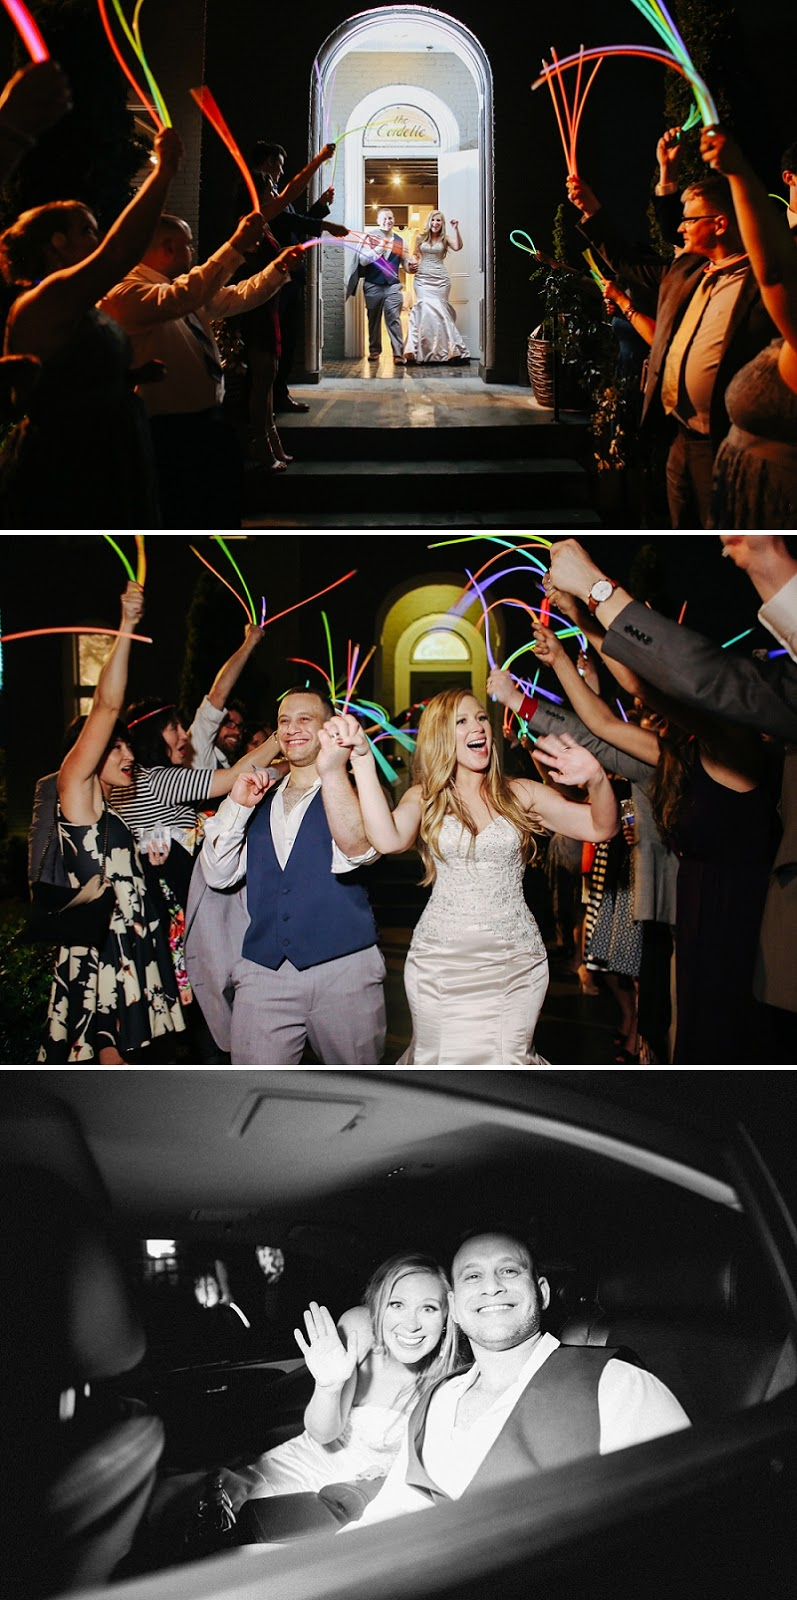 cordell-wedding-photographer-nashville-40.jpeg